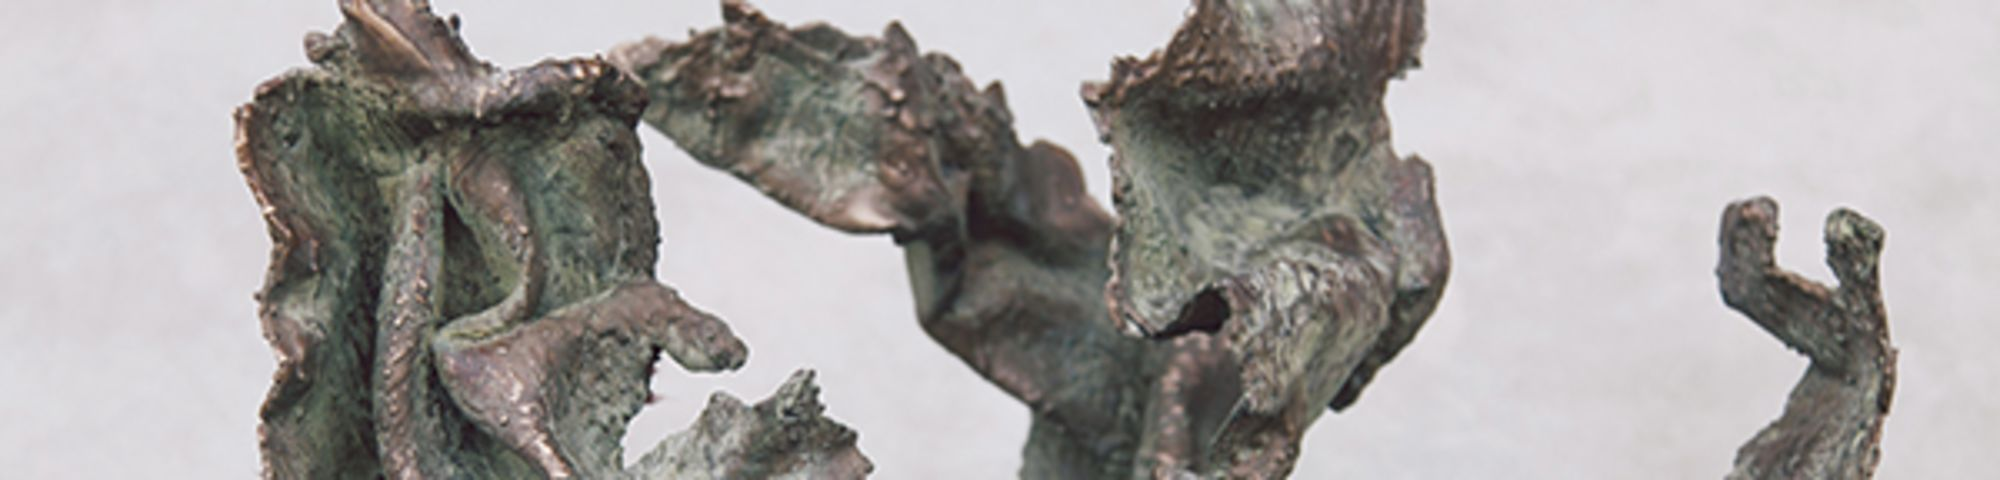 Angel sculpture by Alex J Wood Picton Art Prize